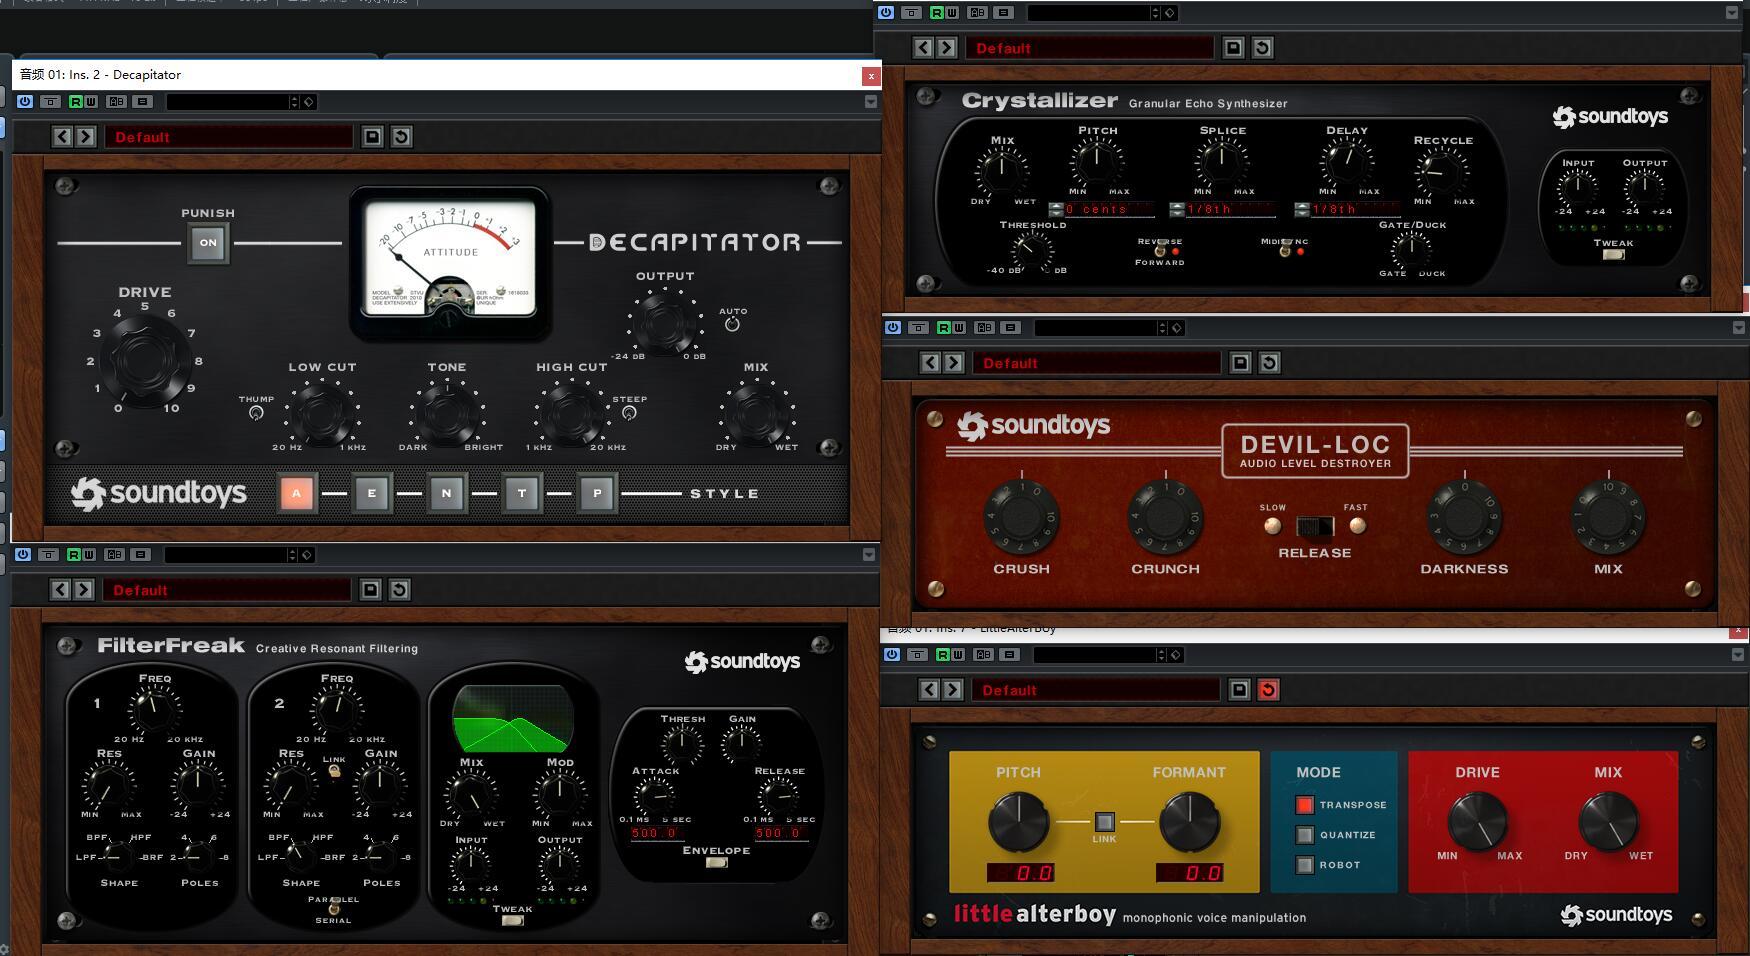 SoundToys 5.0.1特殊音效插件包含EchoBoys效果器VST/AU/RTAS (Win/Mac)